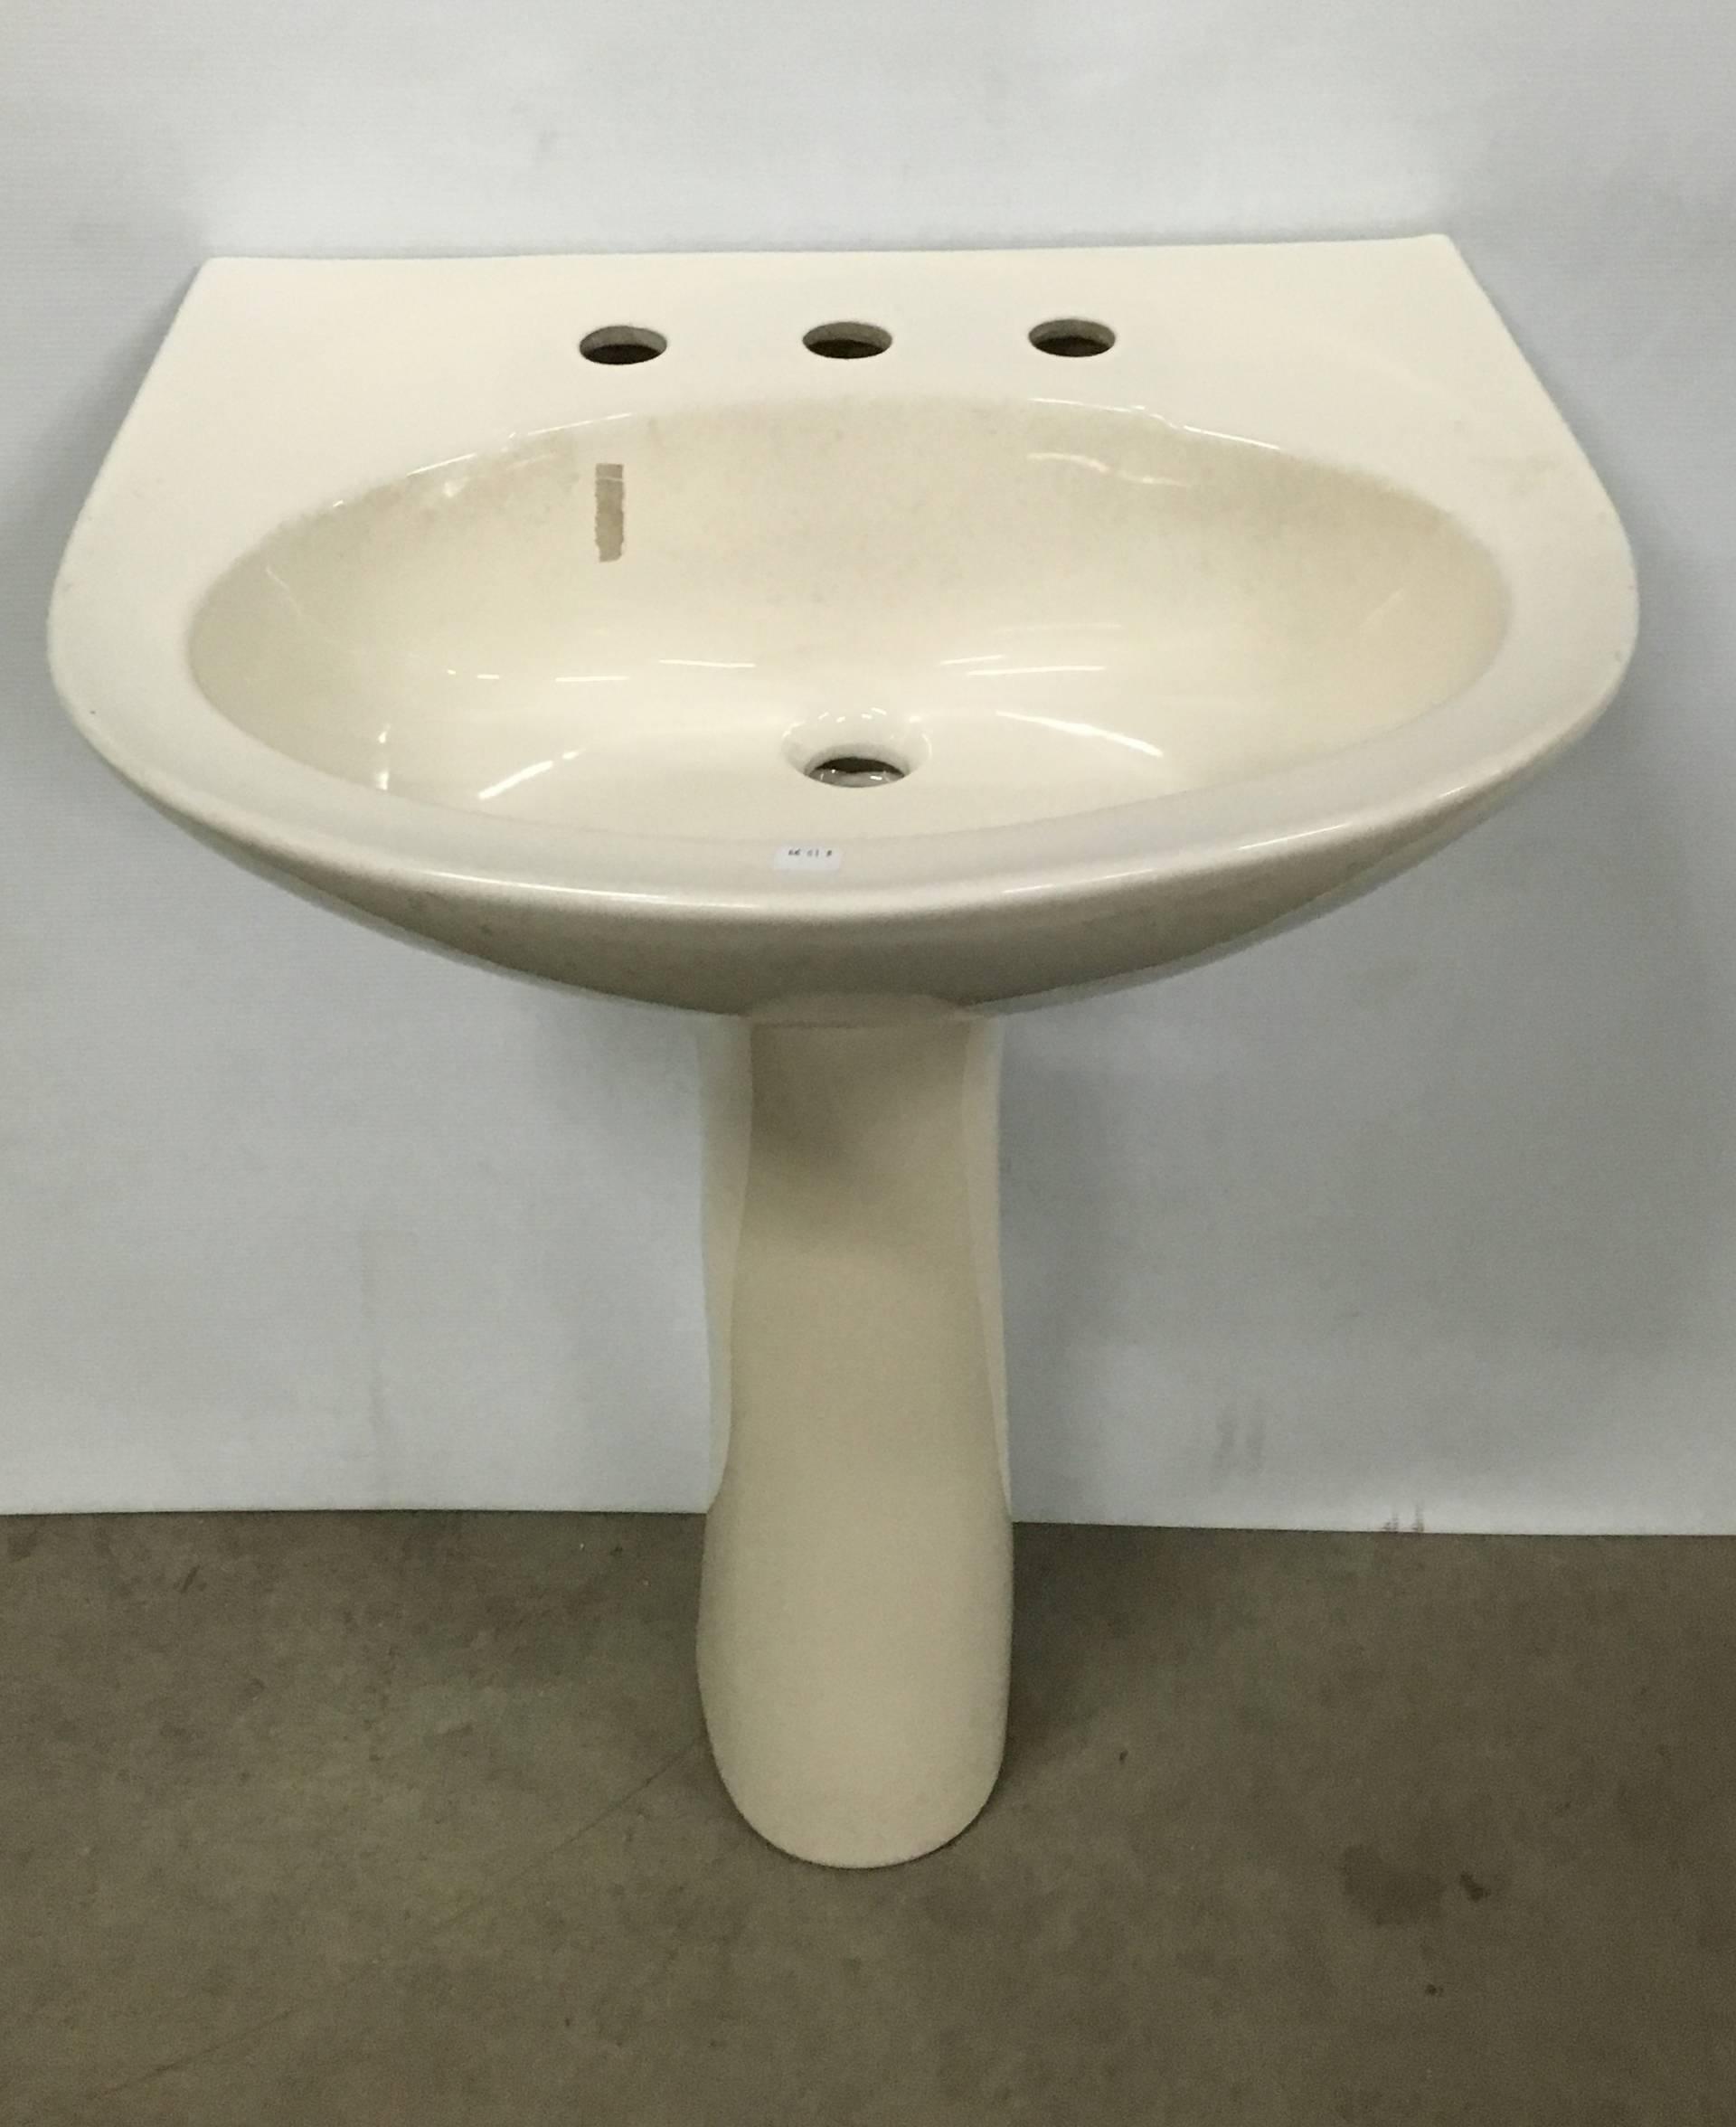 Briggs Altima Bone Pedestal Sink 8 Center Holes